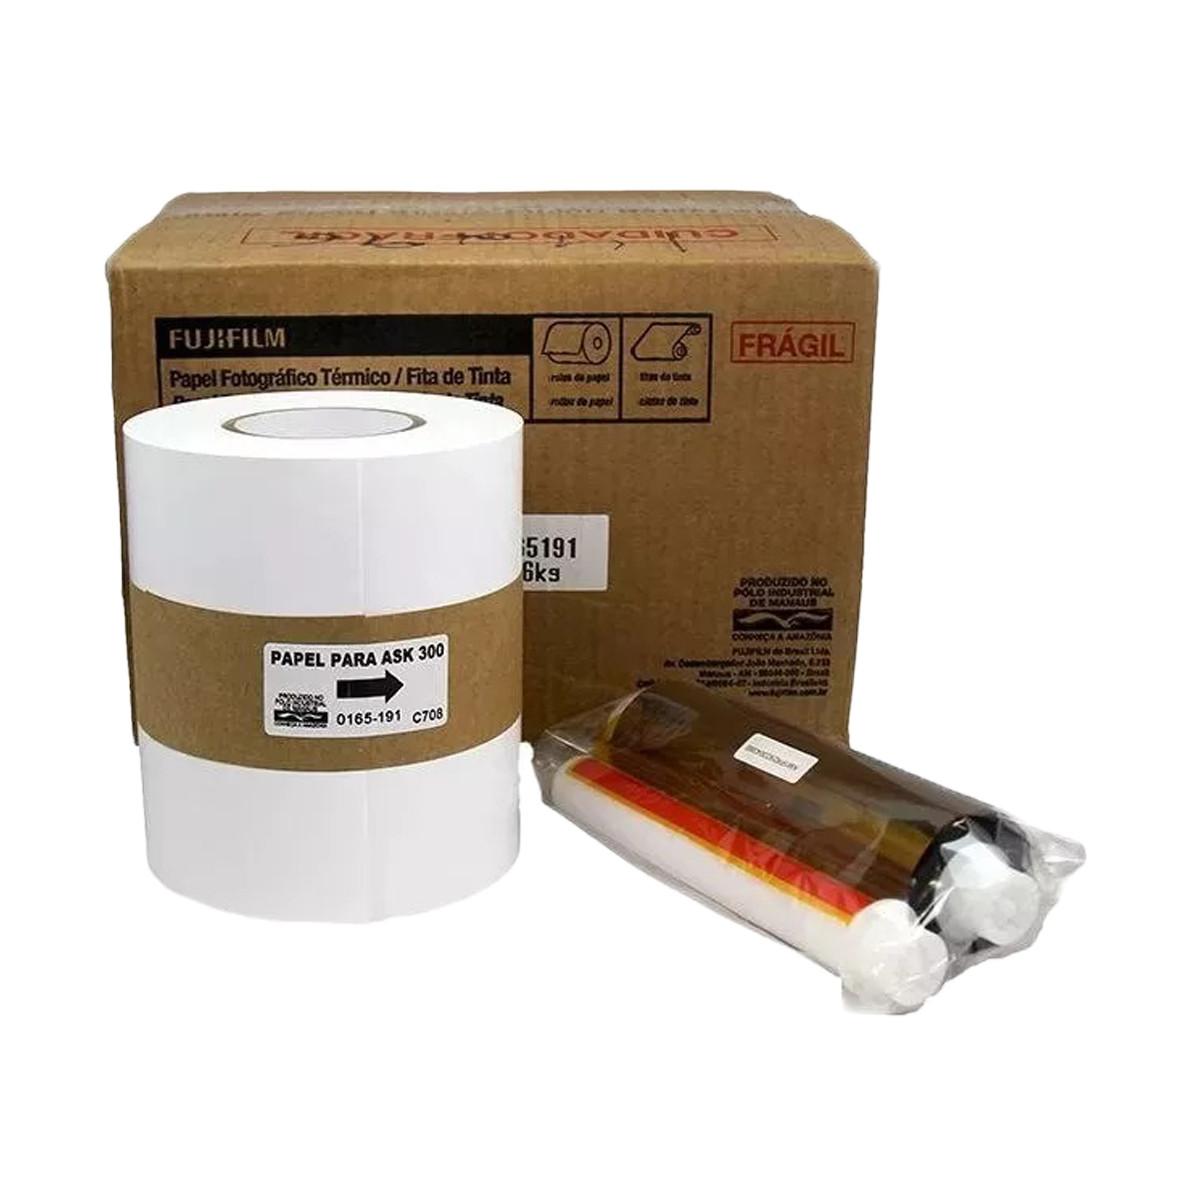 Conjunto de Ribbon e Papel Fujifilm ASK300 10X15 (6x4) 800 cópias